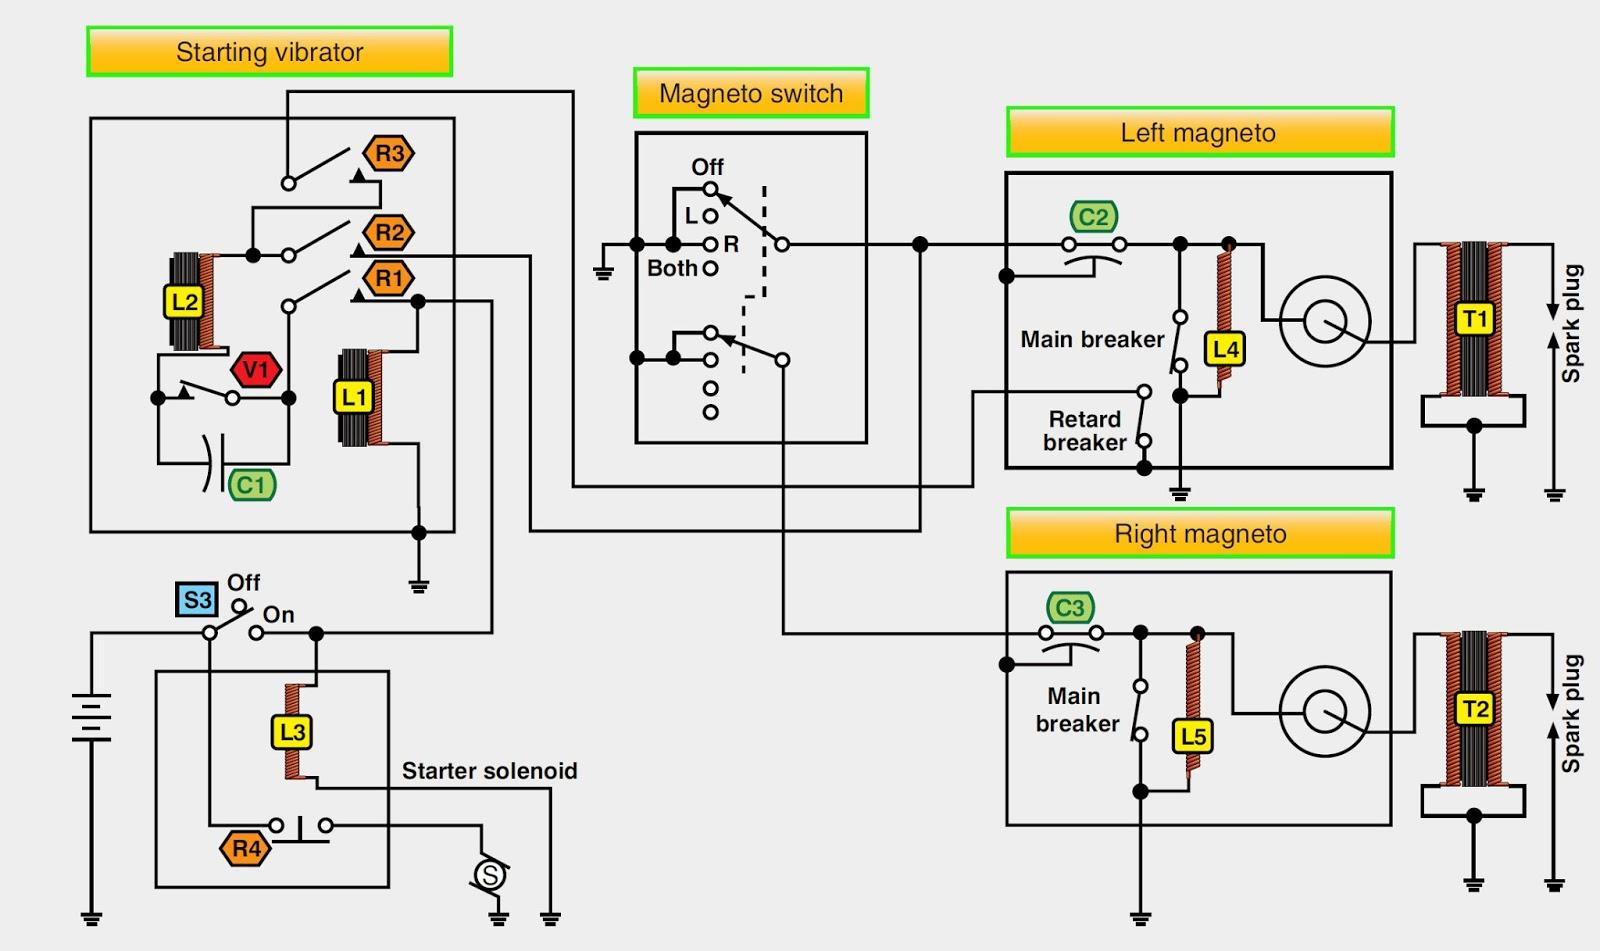 medium resolution of low tension retard breaker magneto and starting vibrator circuit